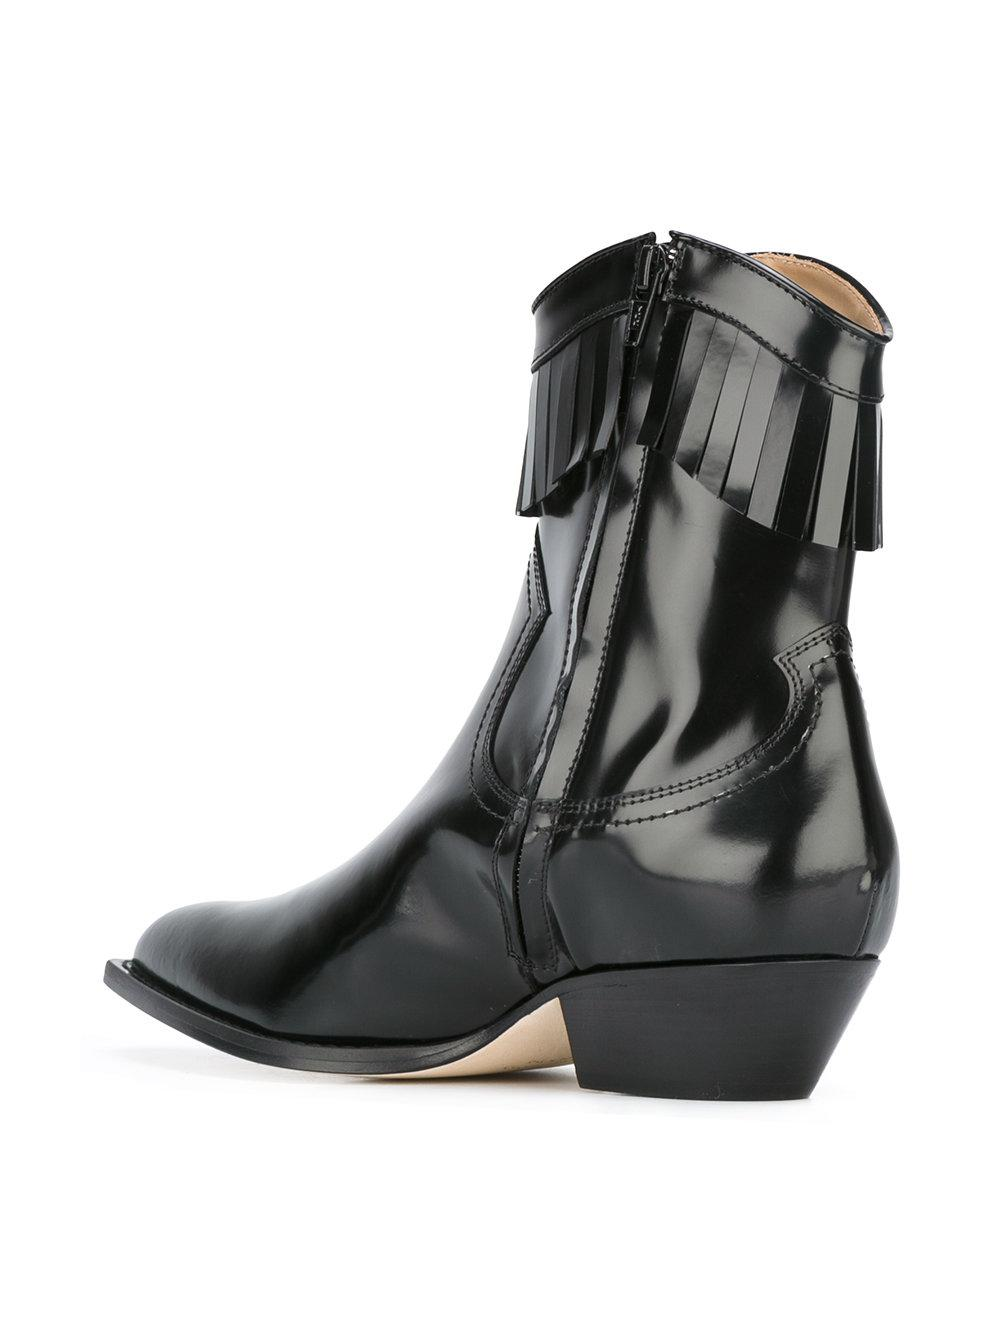 Philosophy Di Lorenzo Serafini Leather Varnished Fringe Cowboy Boots in Black